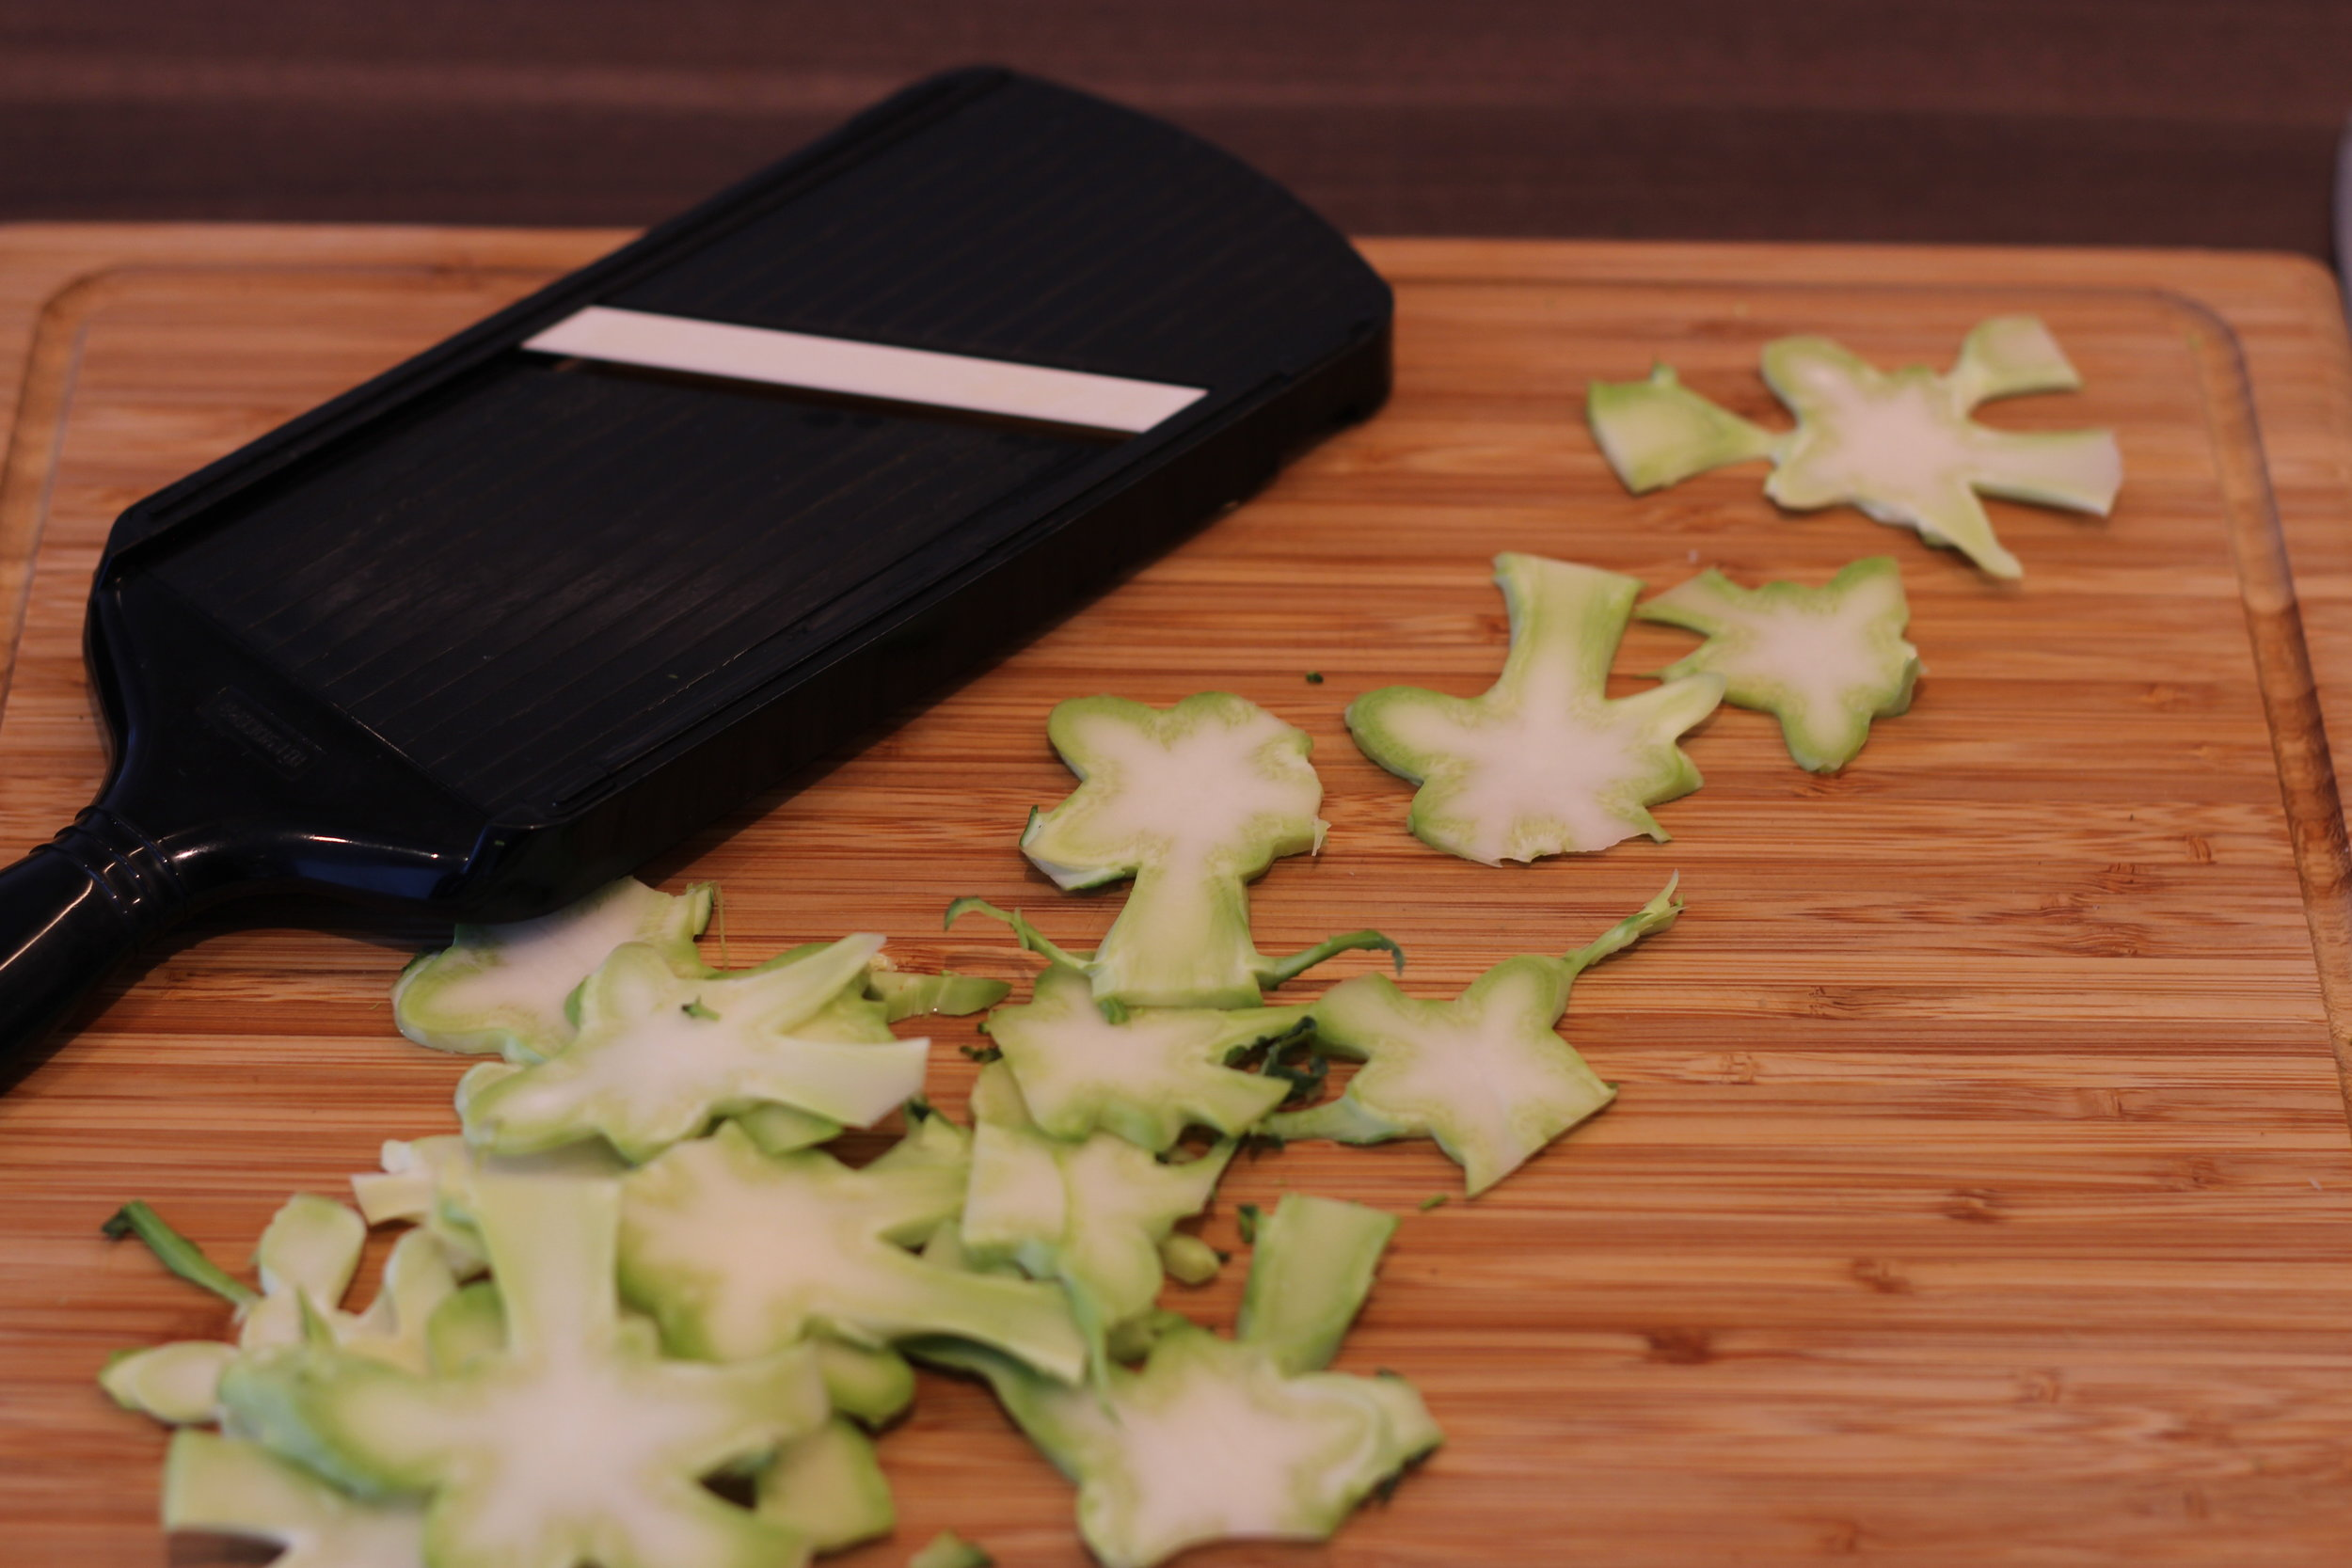 Stjärnig broccolistam